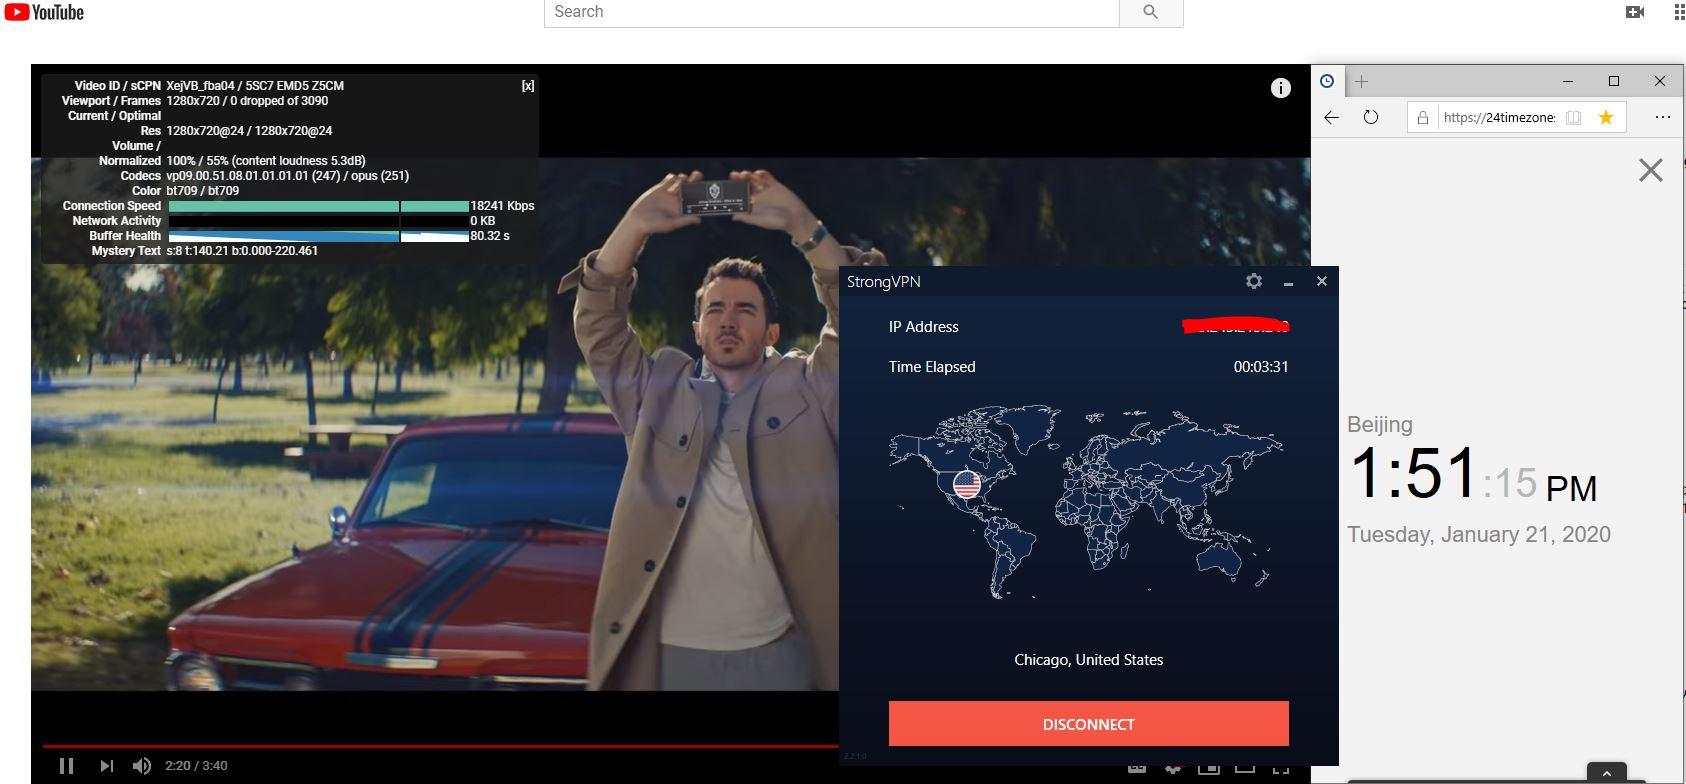 Windows10 StrongVPN USA-Chicago 中国VPN翻墙 科学上网 Youtube测速-20200121-2